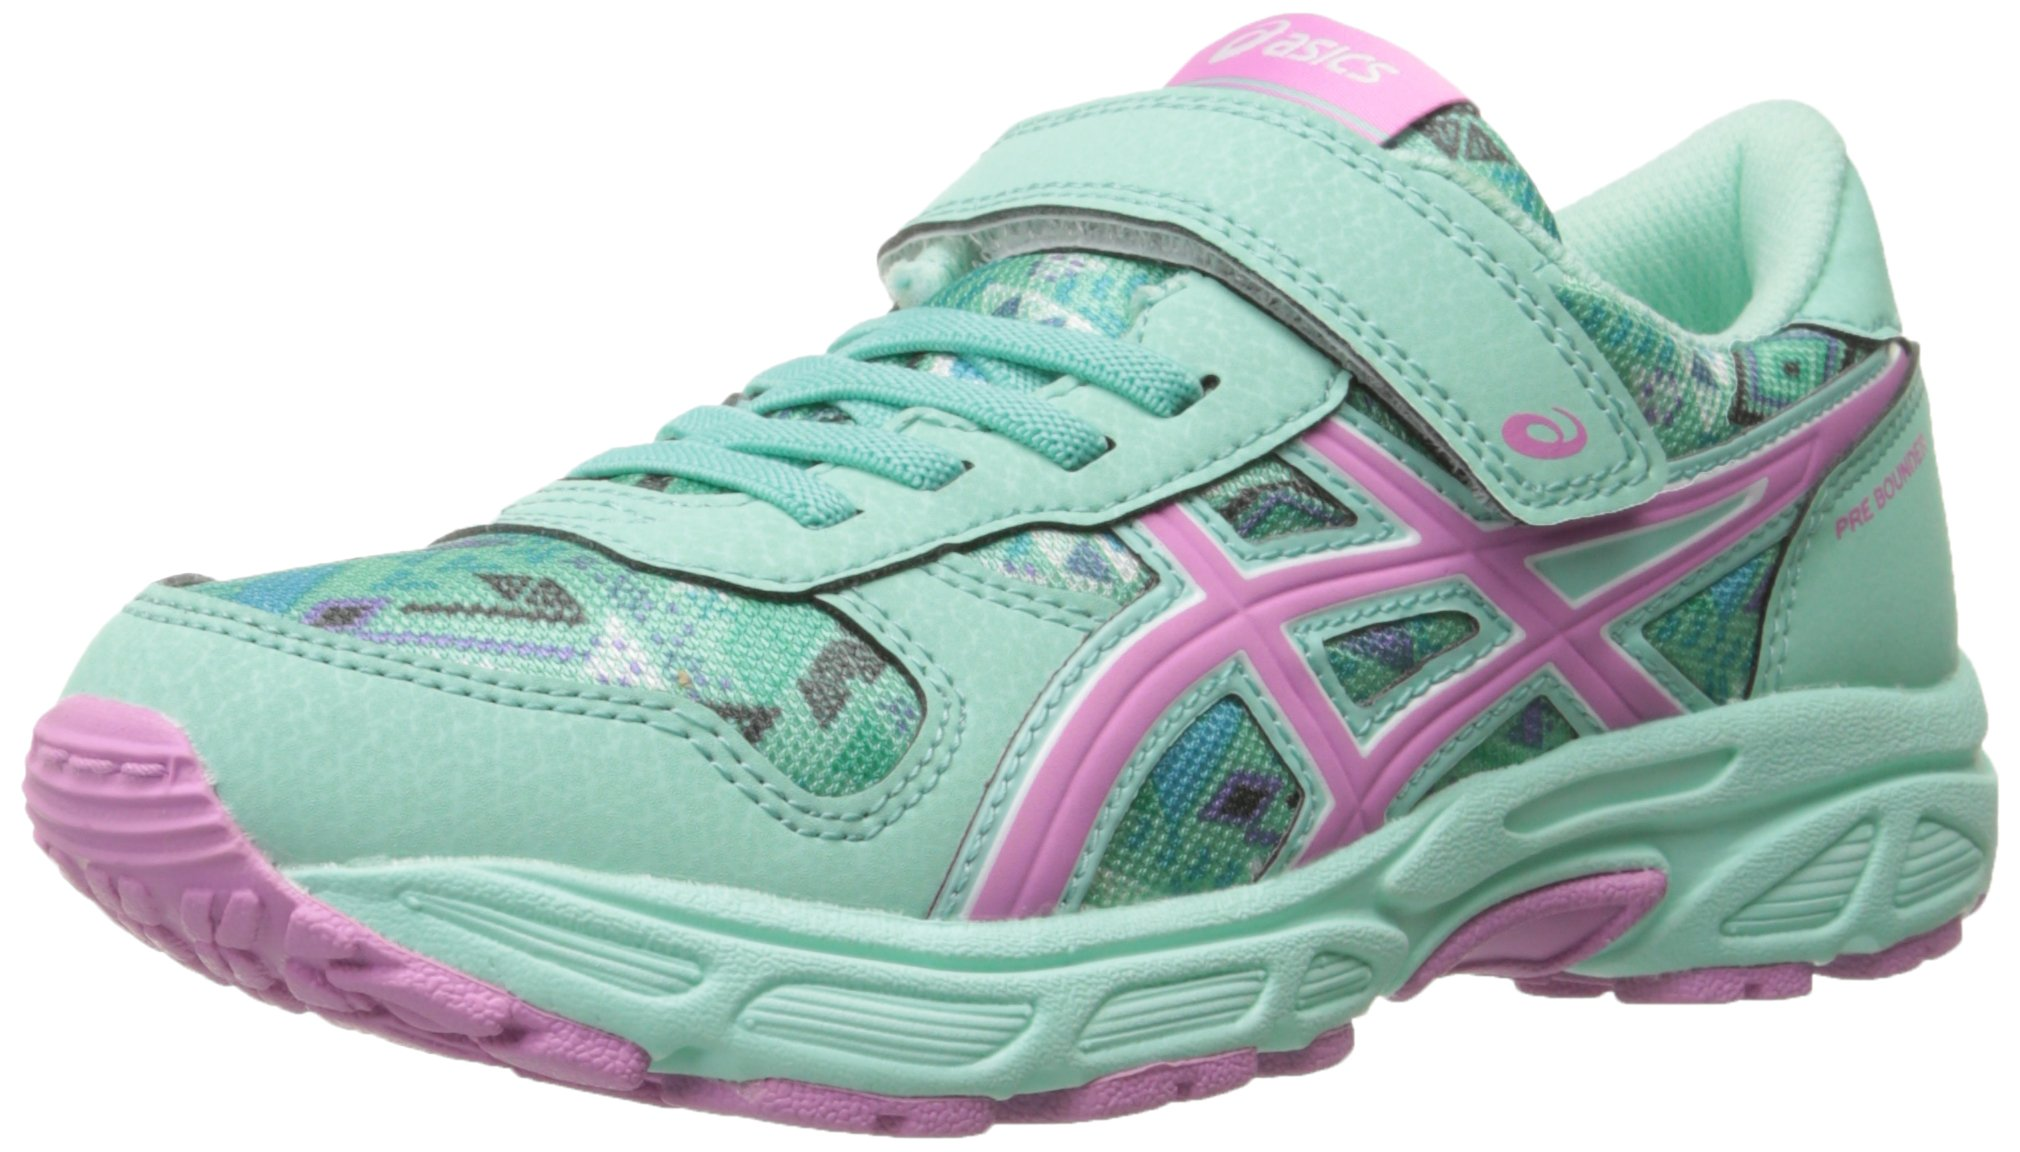 ASICS Pre Bounder PS Running Shoe (Toddler/Little Kid), Beach Glass/Pink/Bermuda, 3 M US Little Kid by ASICS